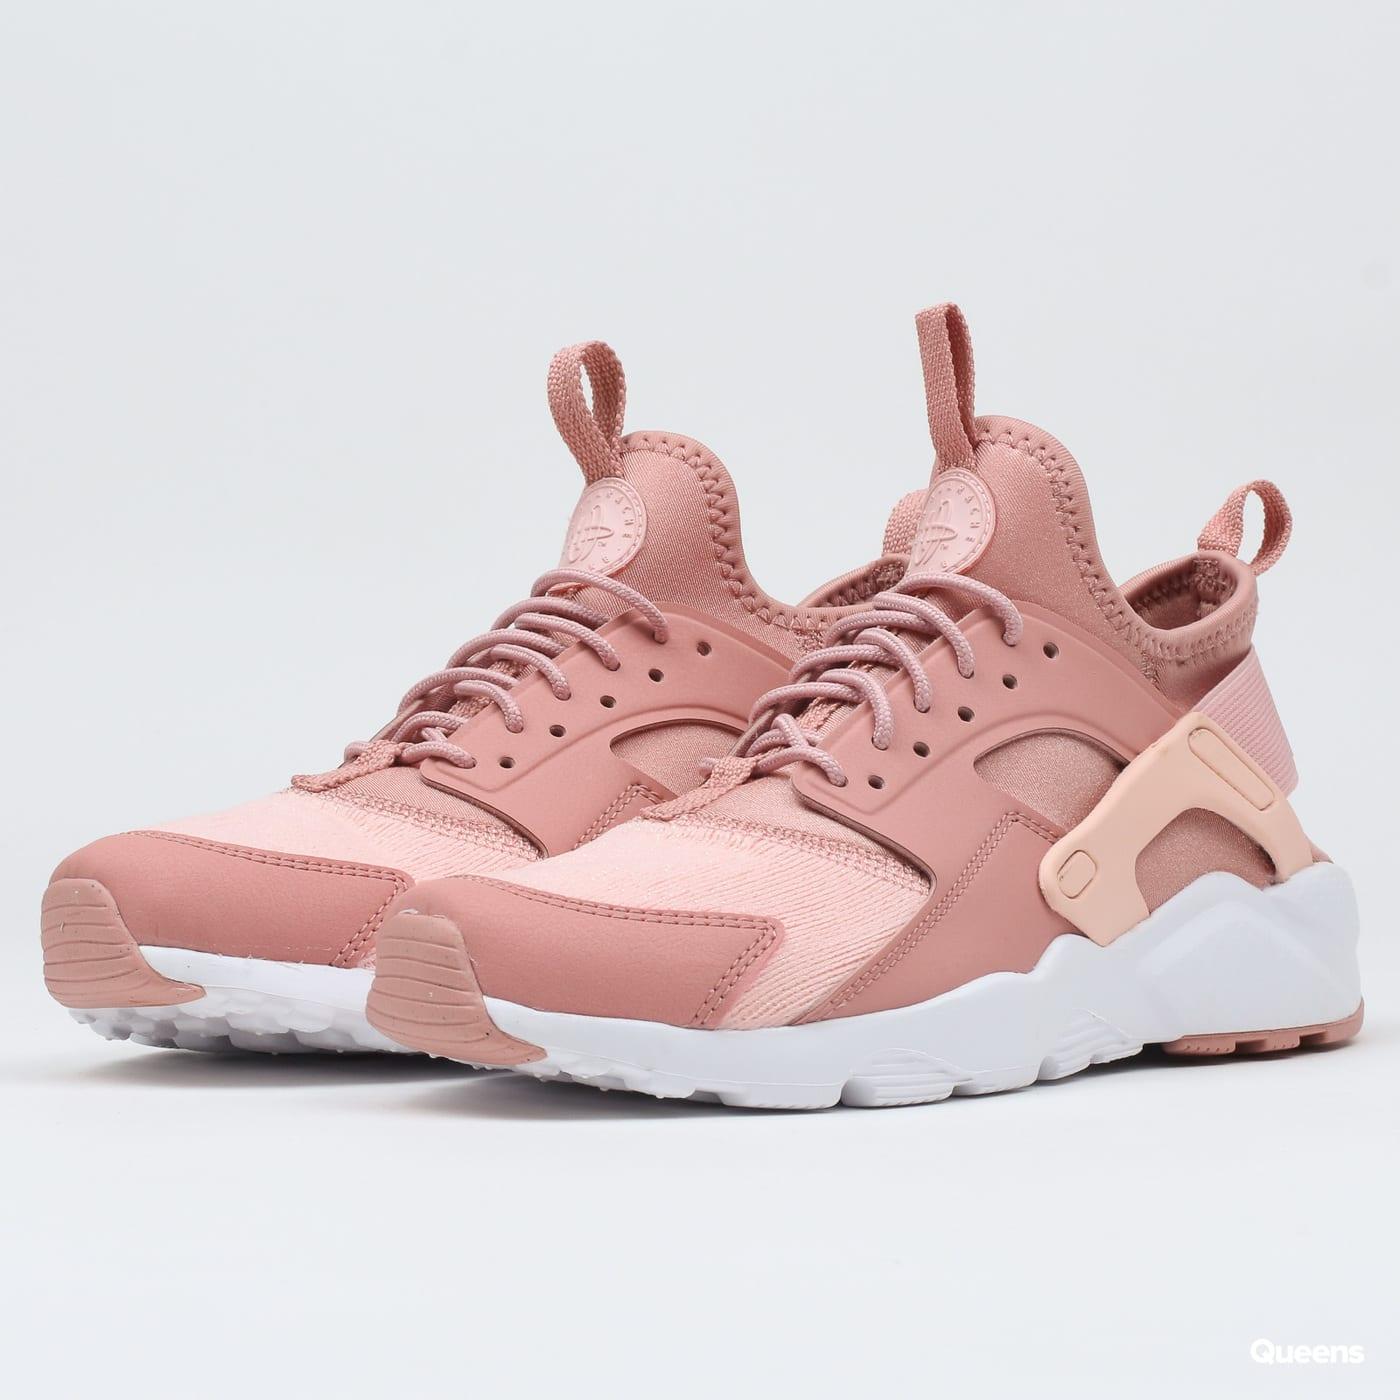 Nike Air Huarache Run Ultra SE (GS) rust pink / storm pink - white